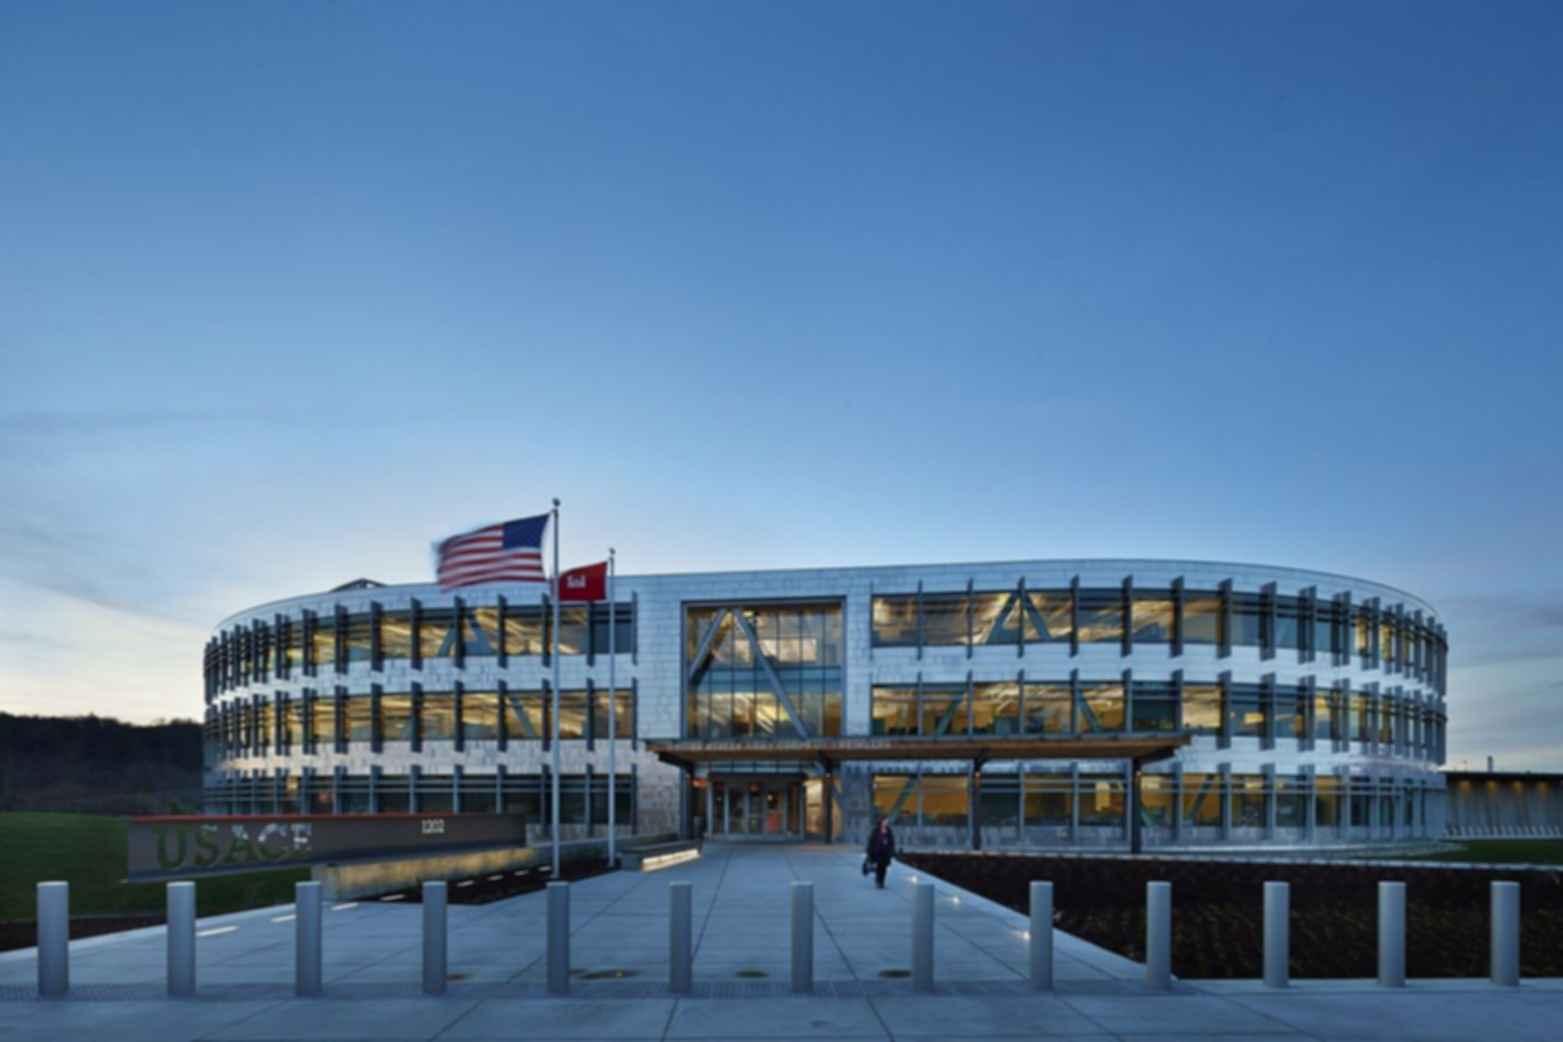 Federal Center South Building 1202 - Exterior/Entrance